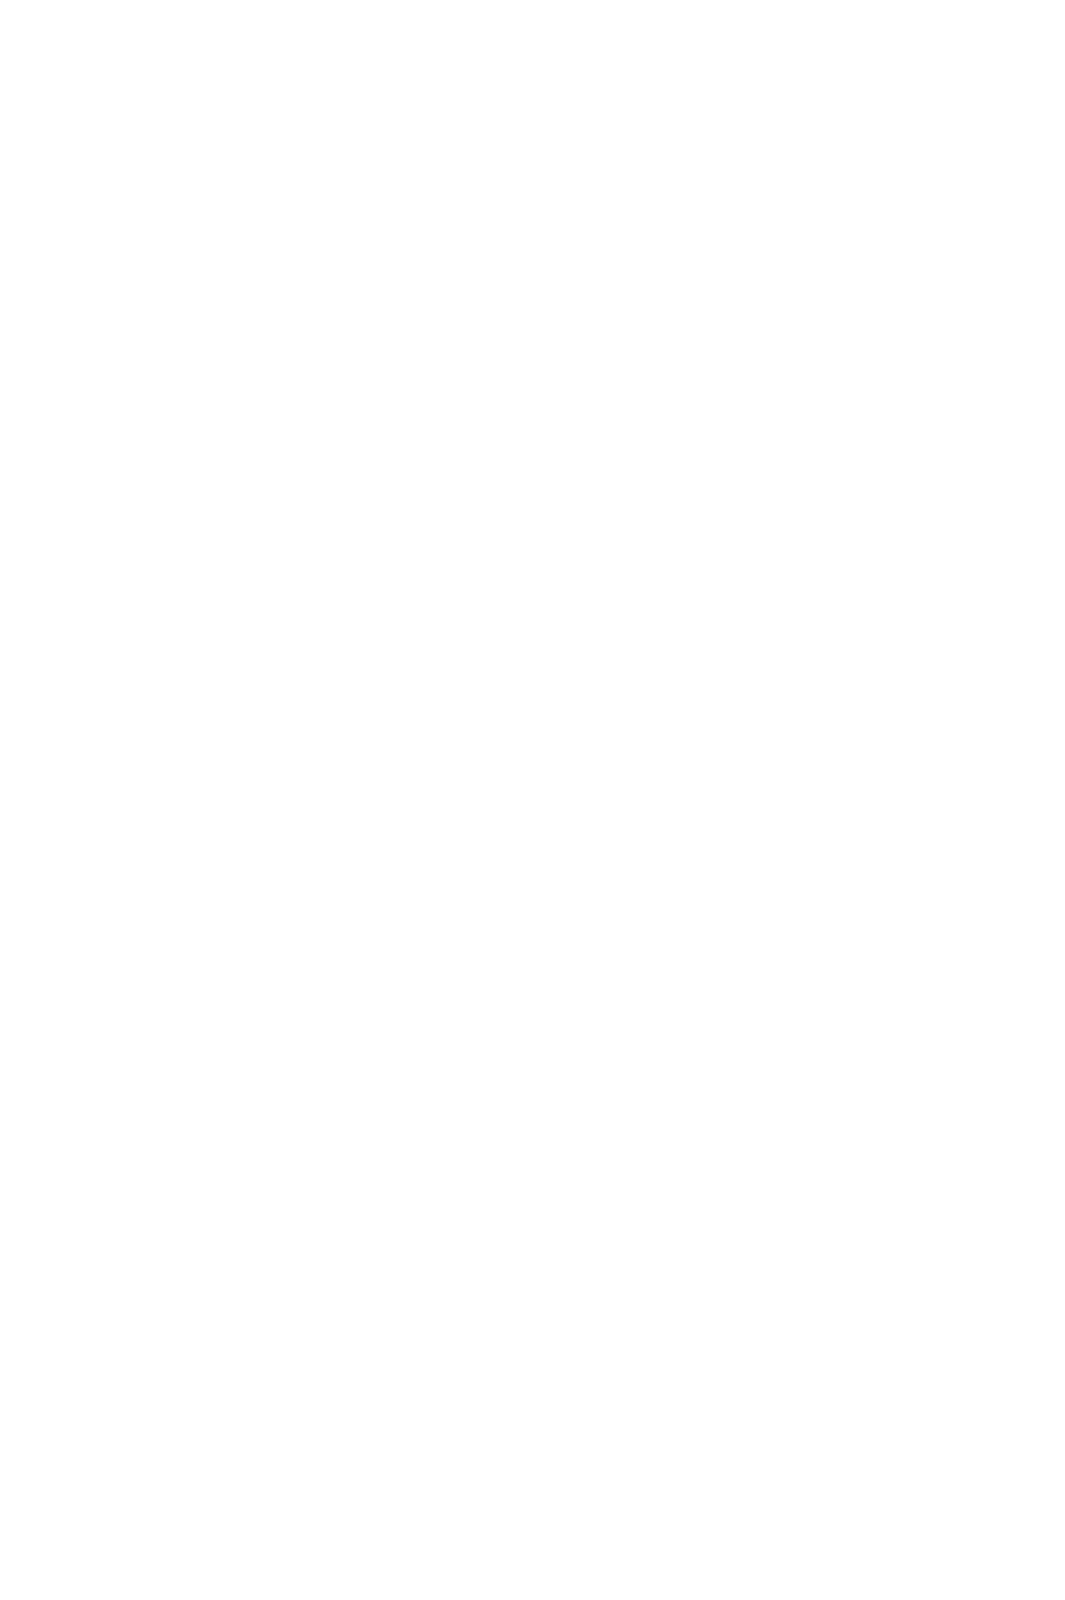 Black MILF Nylons